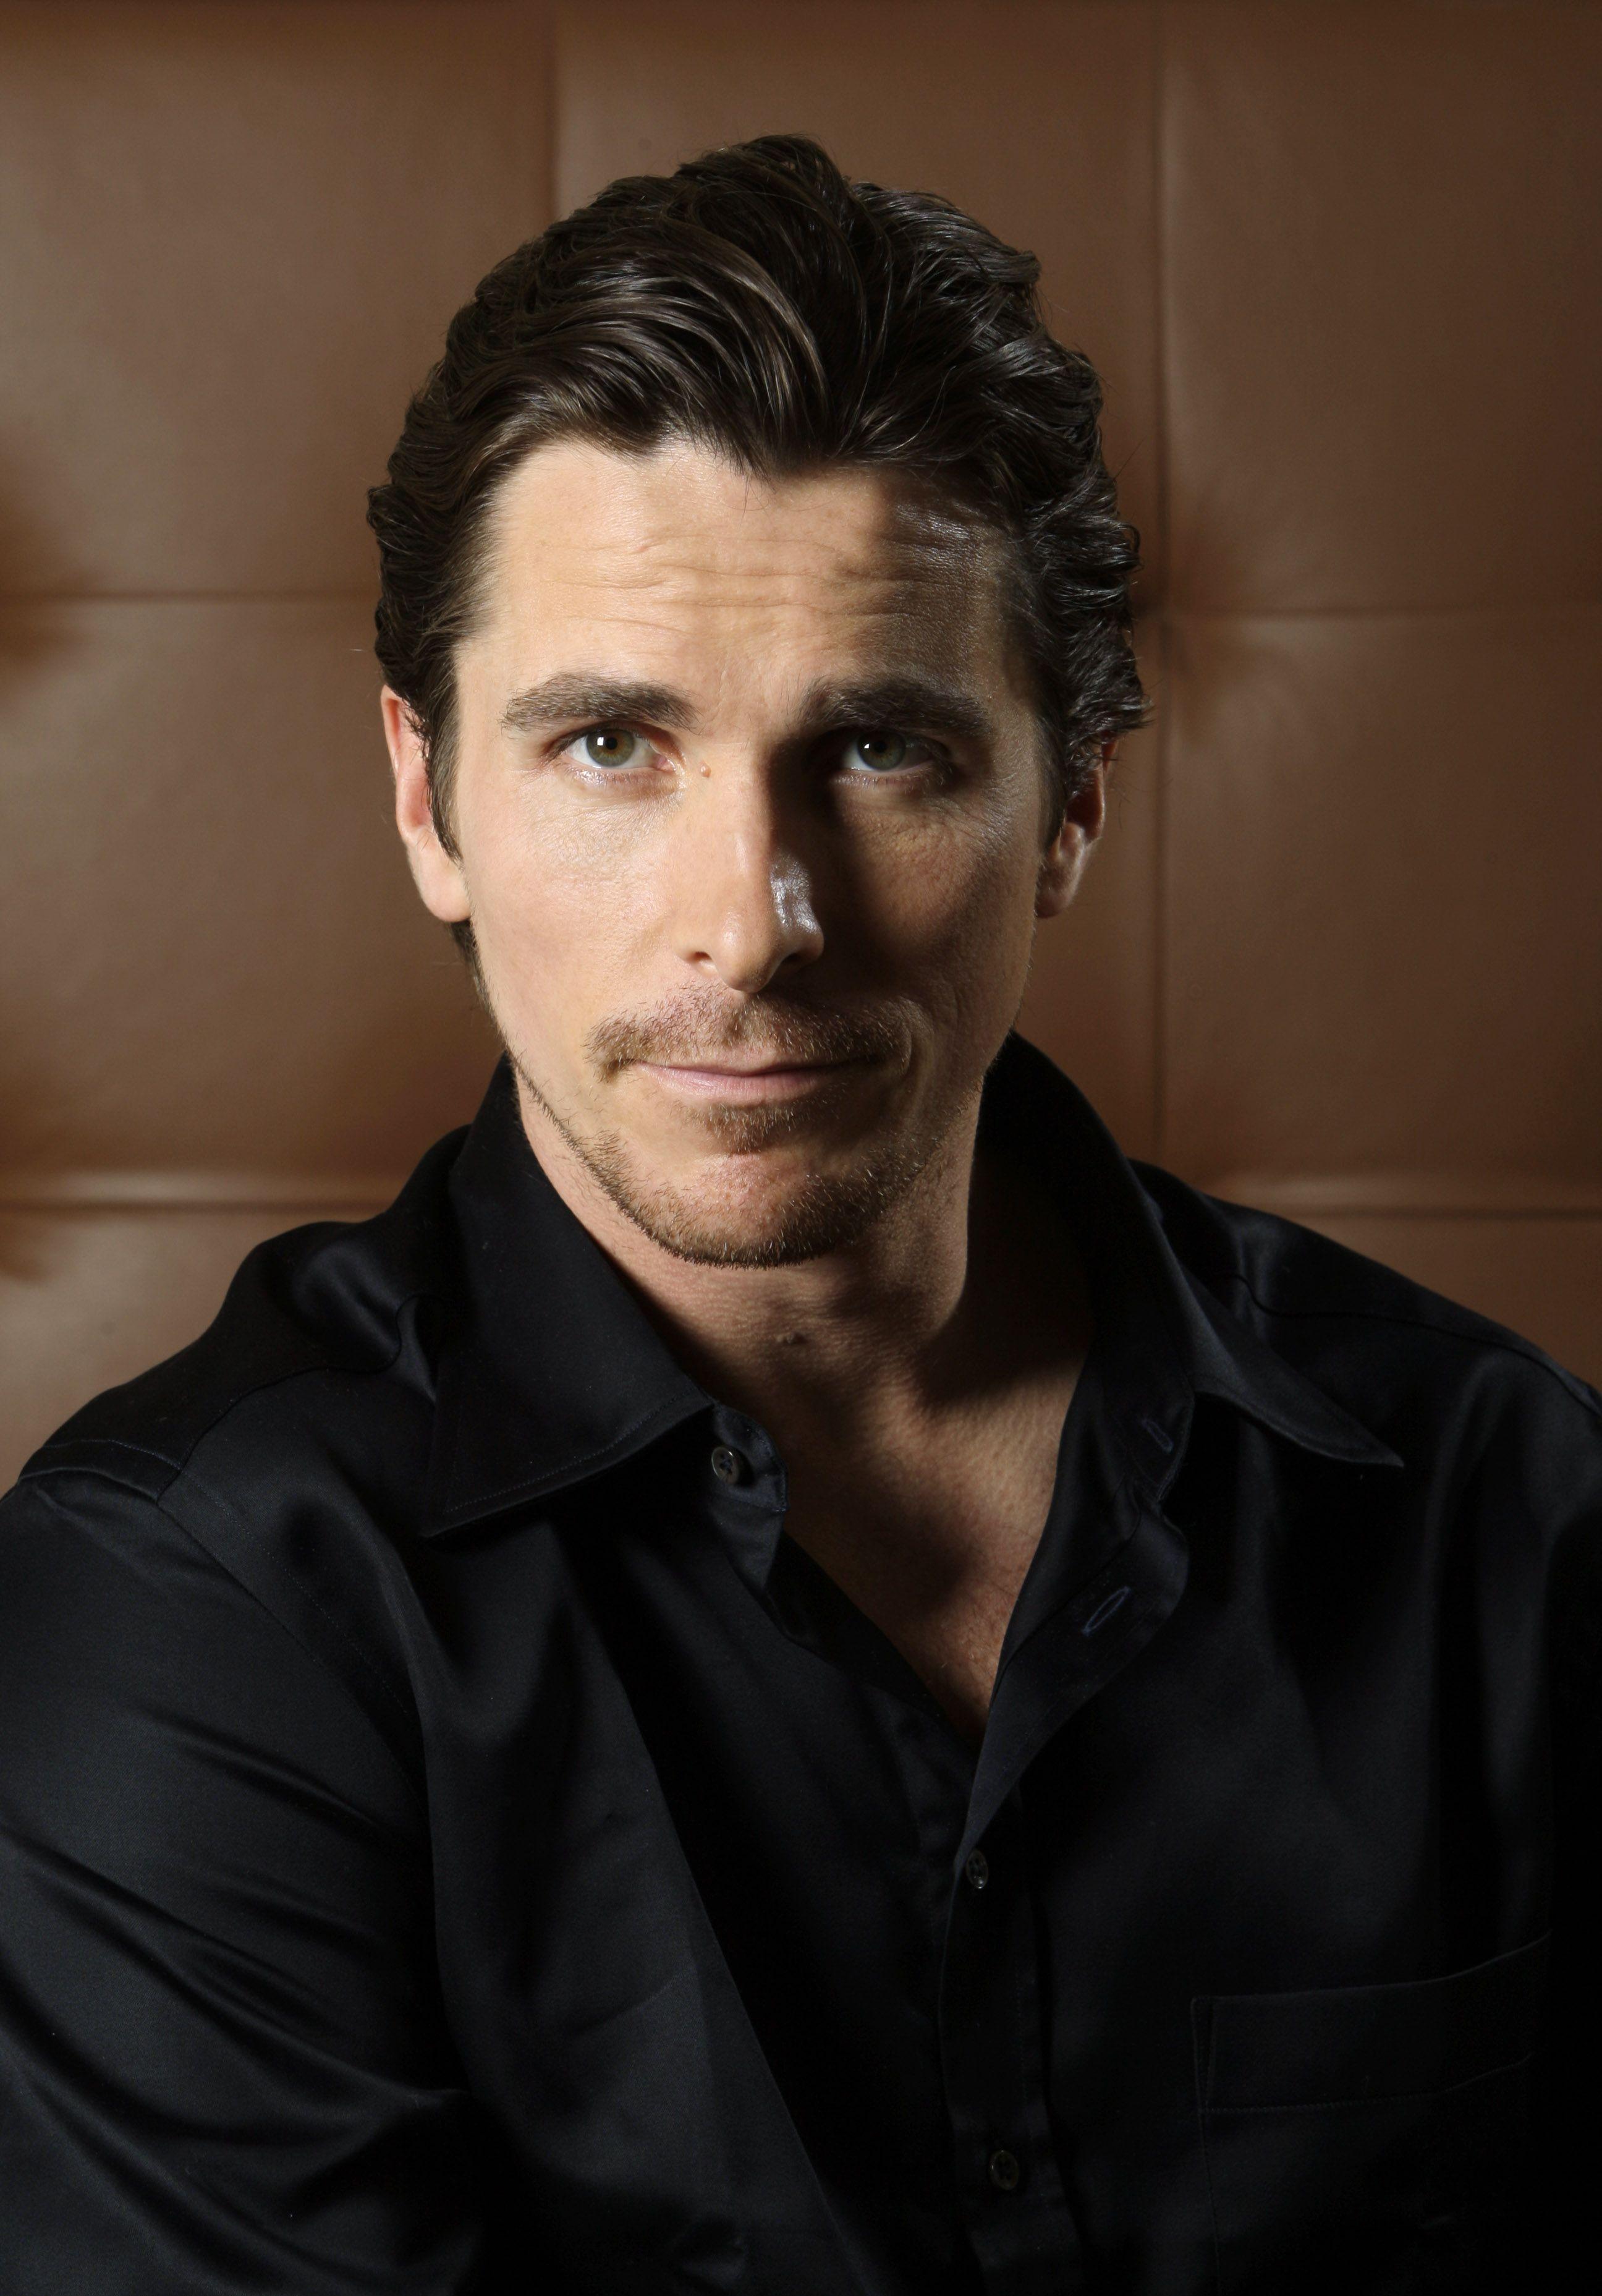 Christian Bale Galeri | Christian Bale | Pinterest | Christian and ...